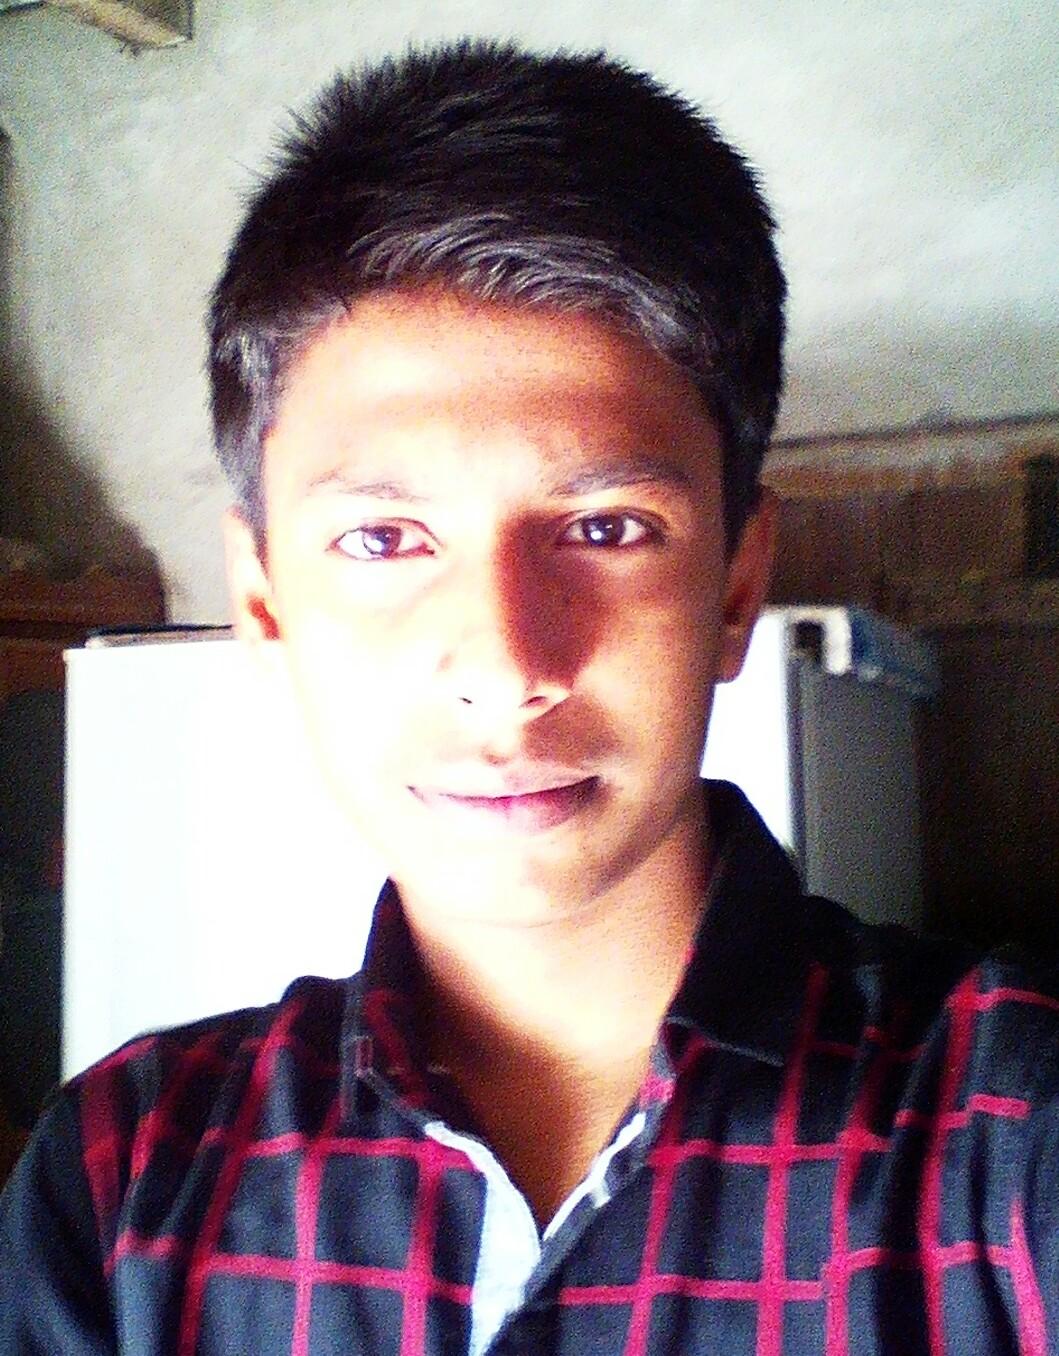 NishaN Ahmed